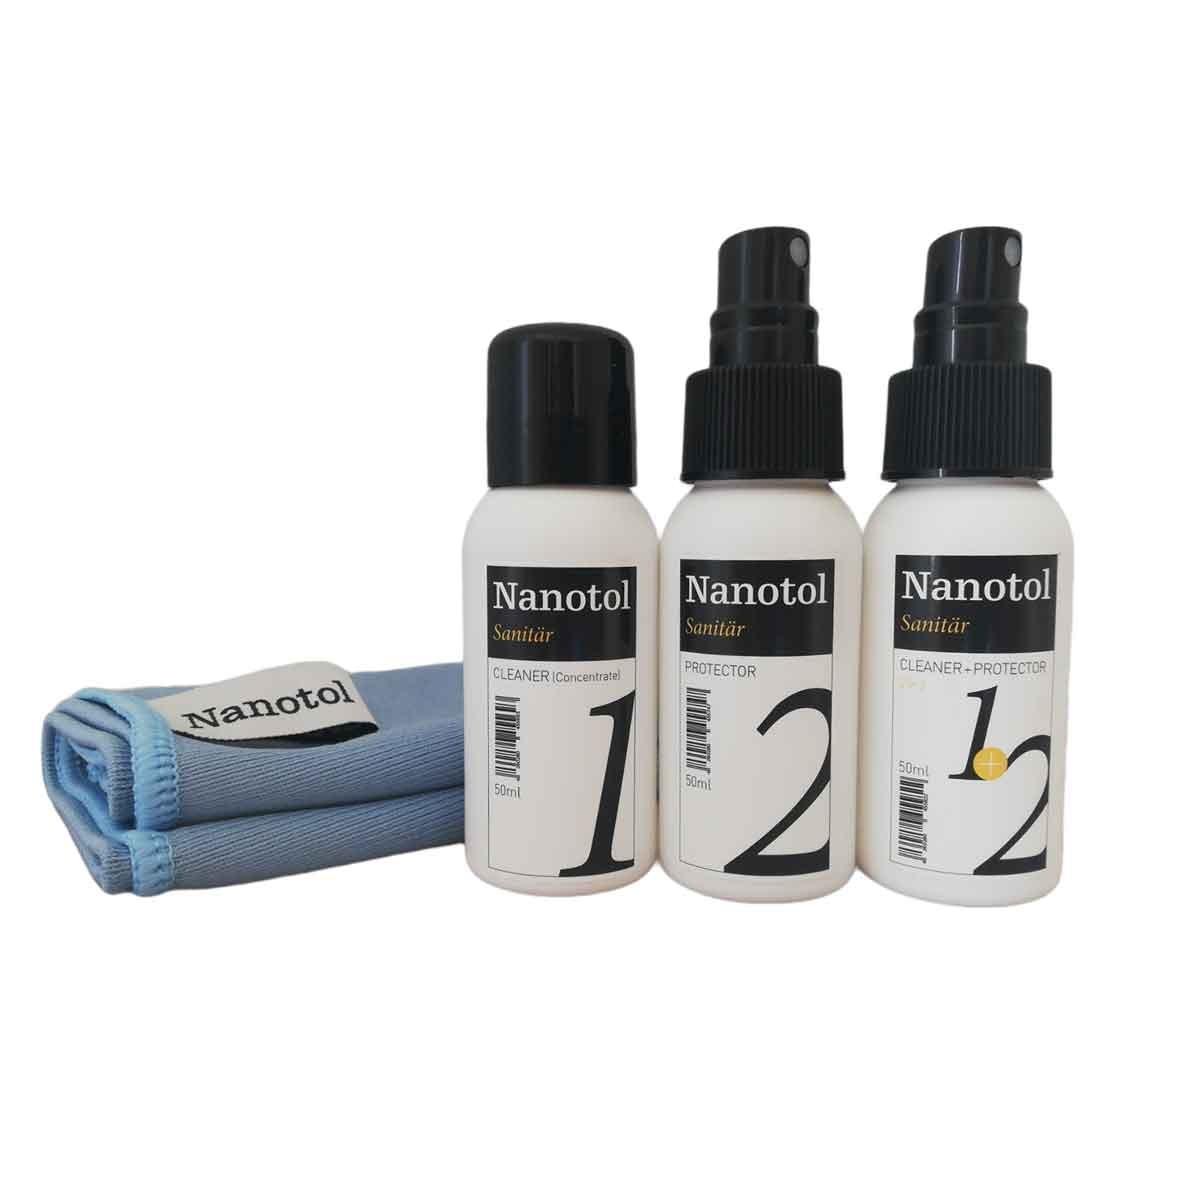 Nanotol Sanitär Test-Set